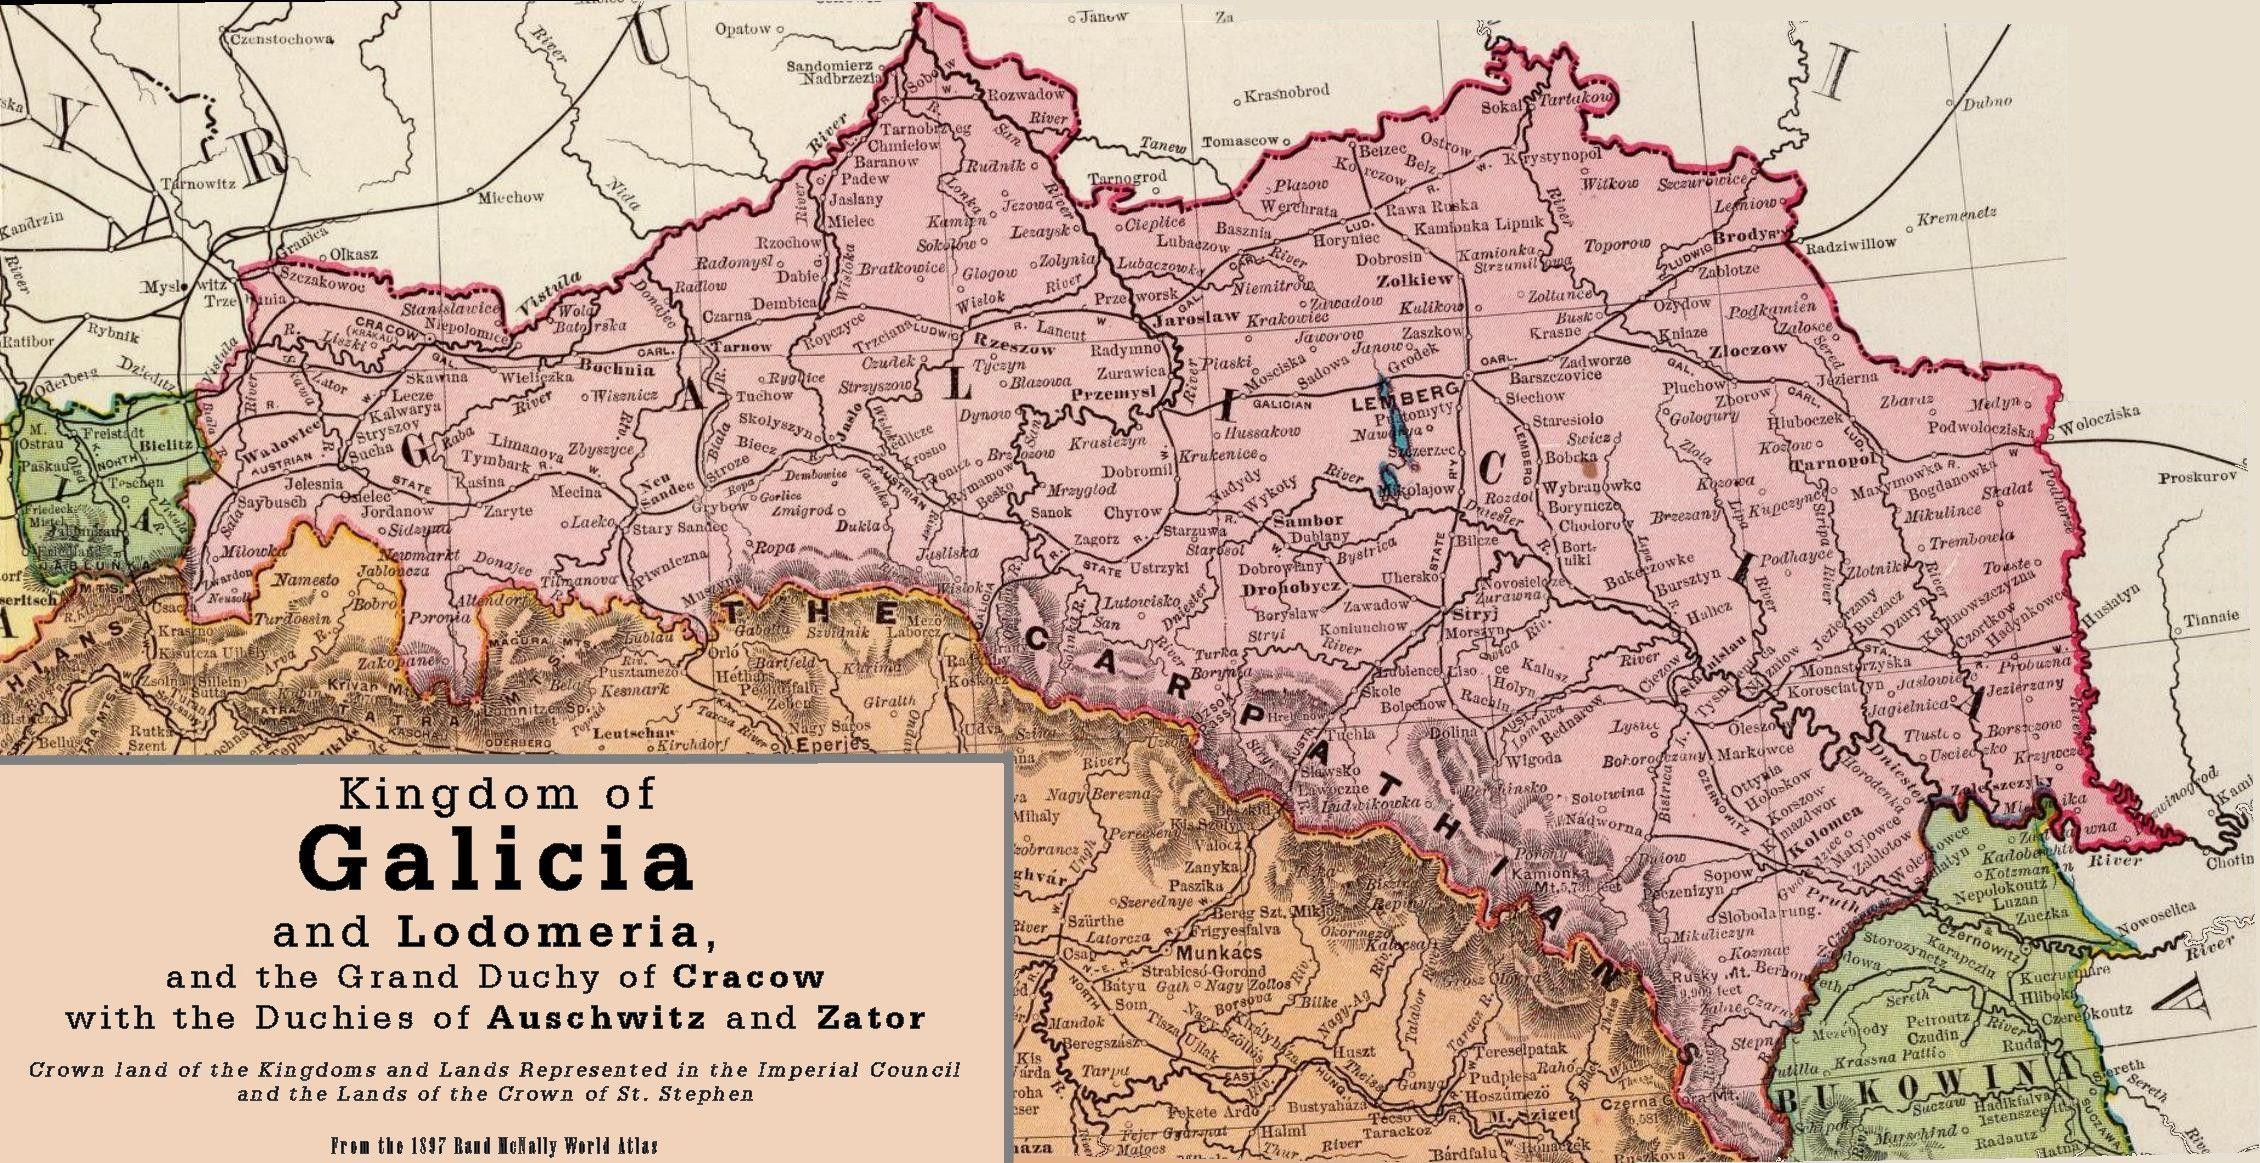 Galicia 1897 1 - Kingdom of Galicia and Lodomeria ... on second polish republic, europe poland map, ukrainian greek catholic church, czechoslovakia poland map, lviv poland map, kingdom of galicia and lodomeria, duchy of warsaw, hungary poland map, lodz poland map, gdansk poland map, warsaw ghetto poland map, mazovia poland map, kingdom of poland map, china poland map, jaworzno poland map, russia poland map, estonia poland map, sweden poland map, turkey poland map, pale of settlement, carpathian mountains, katowice poland map, wwii poland map, germany poland map, poznan poland map, lublin poland map, carpathian ruthenia,